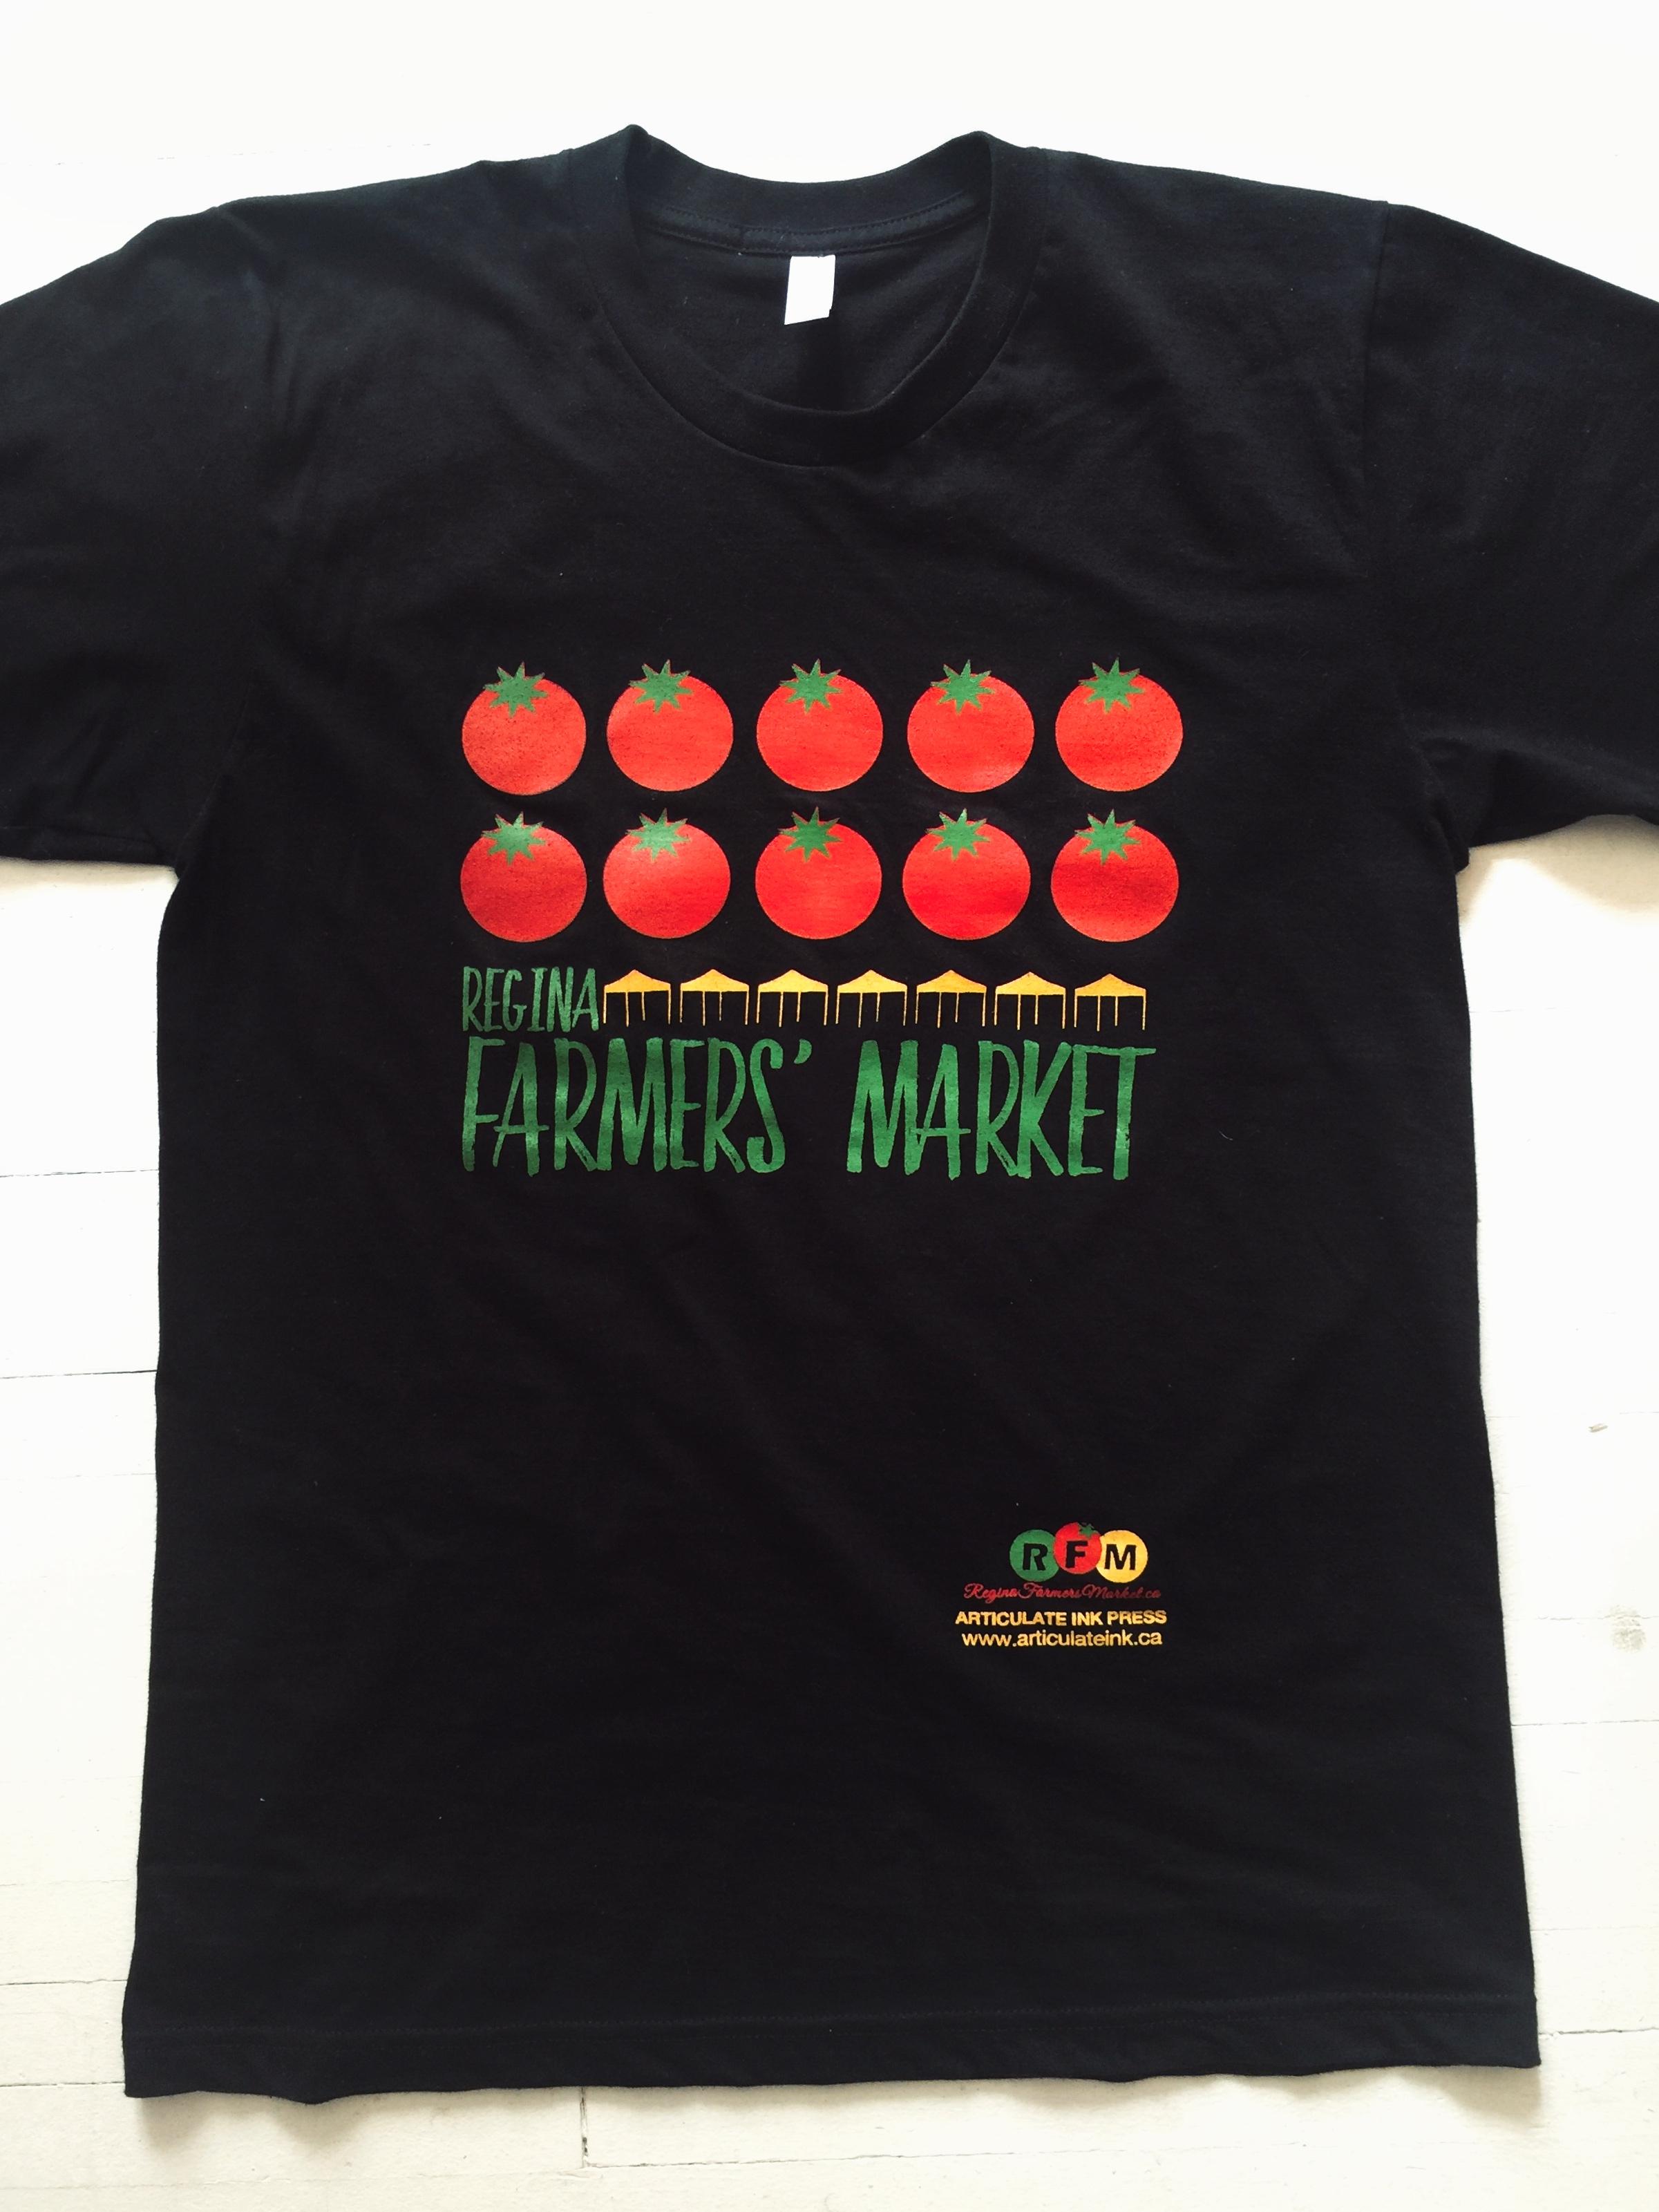 August 13 Map & Biggest Market Ever! - Image 2